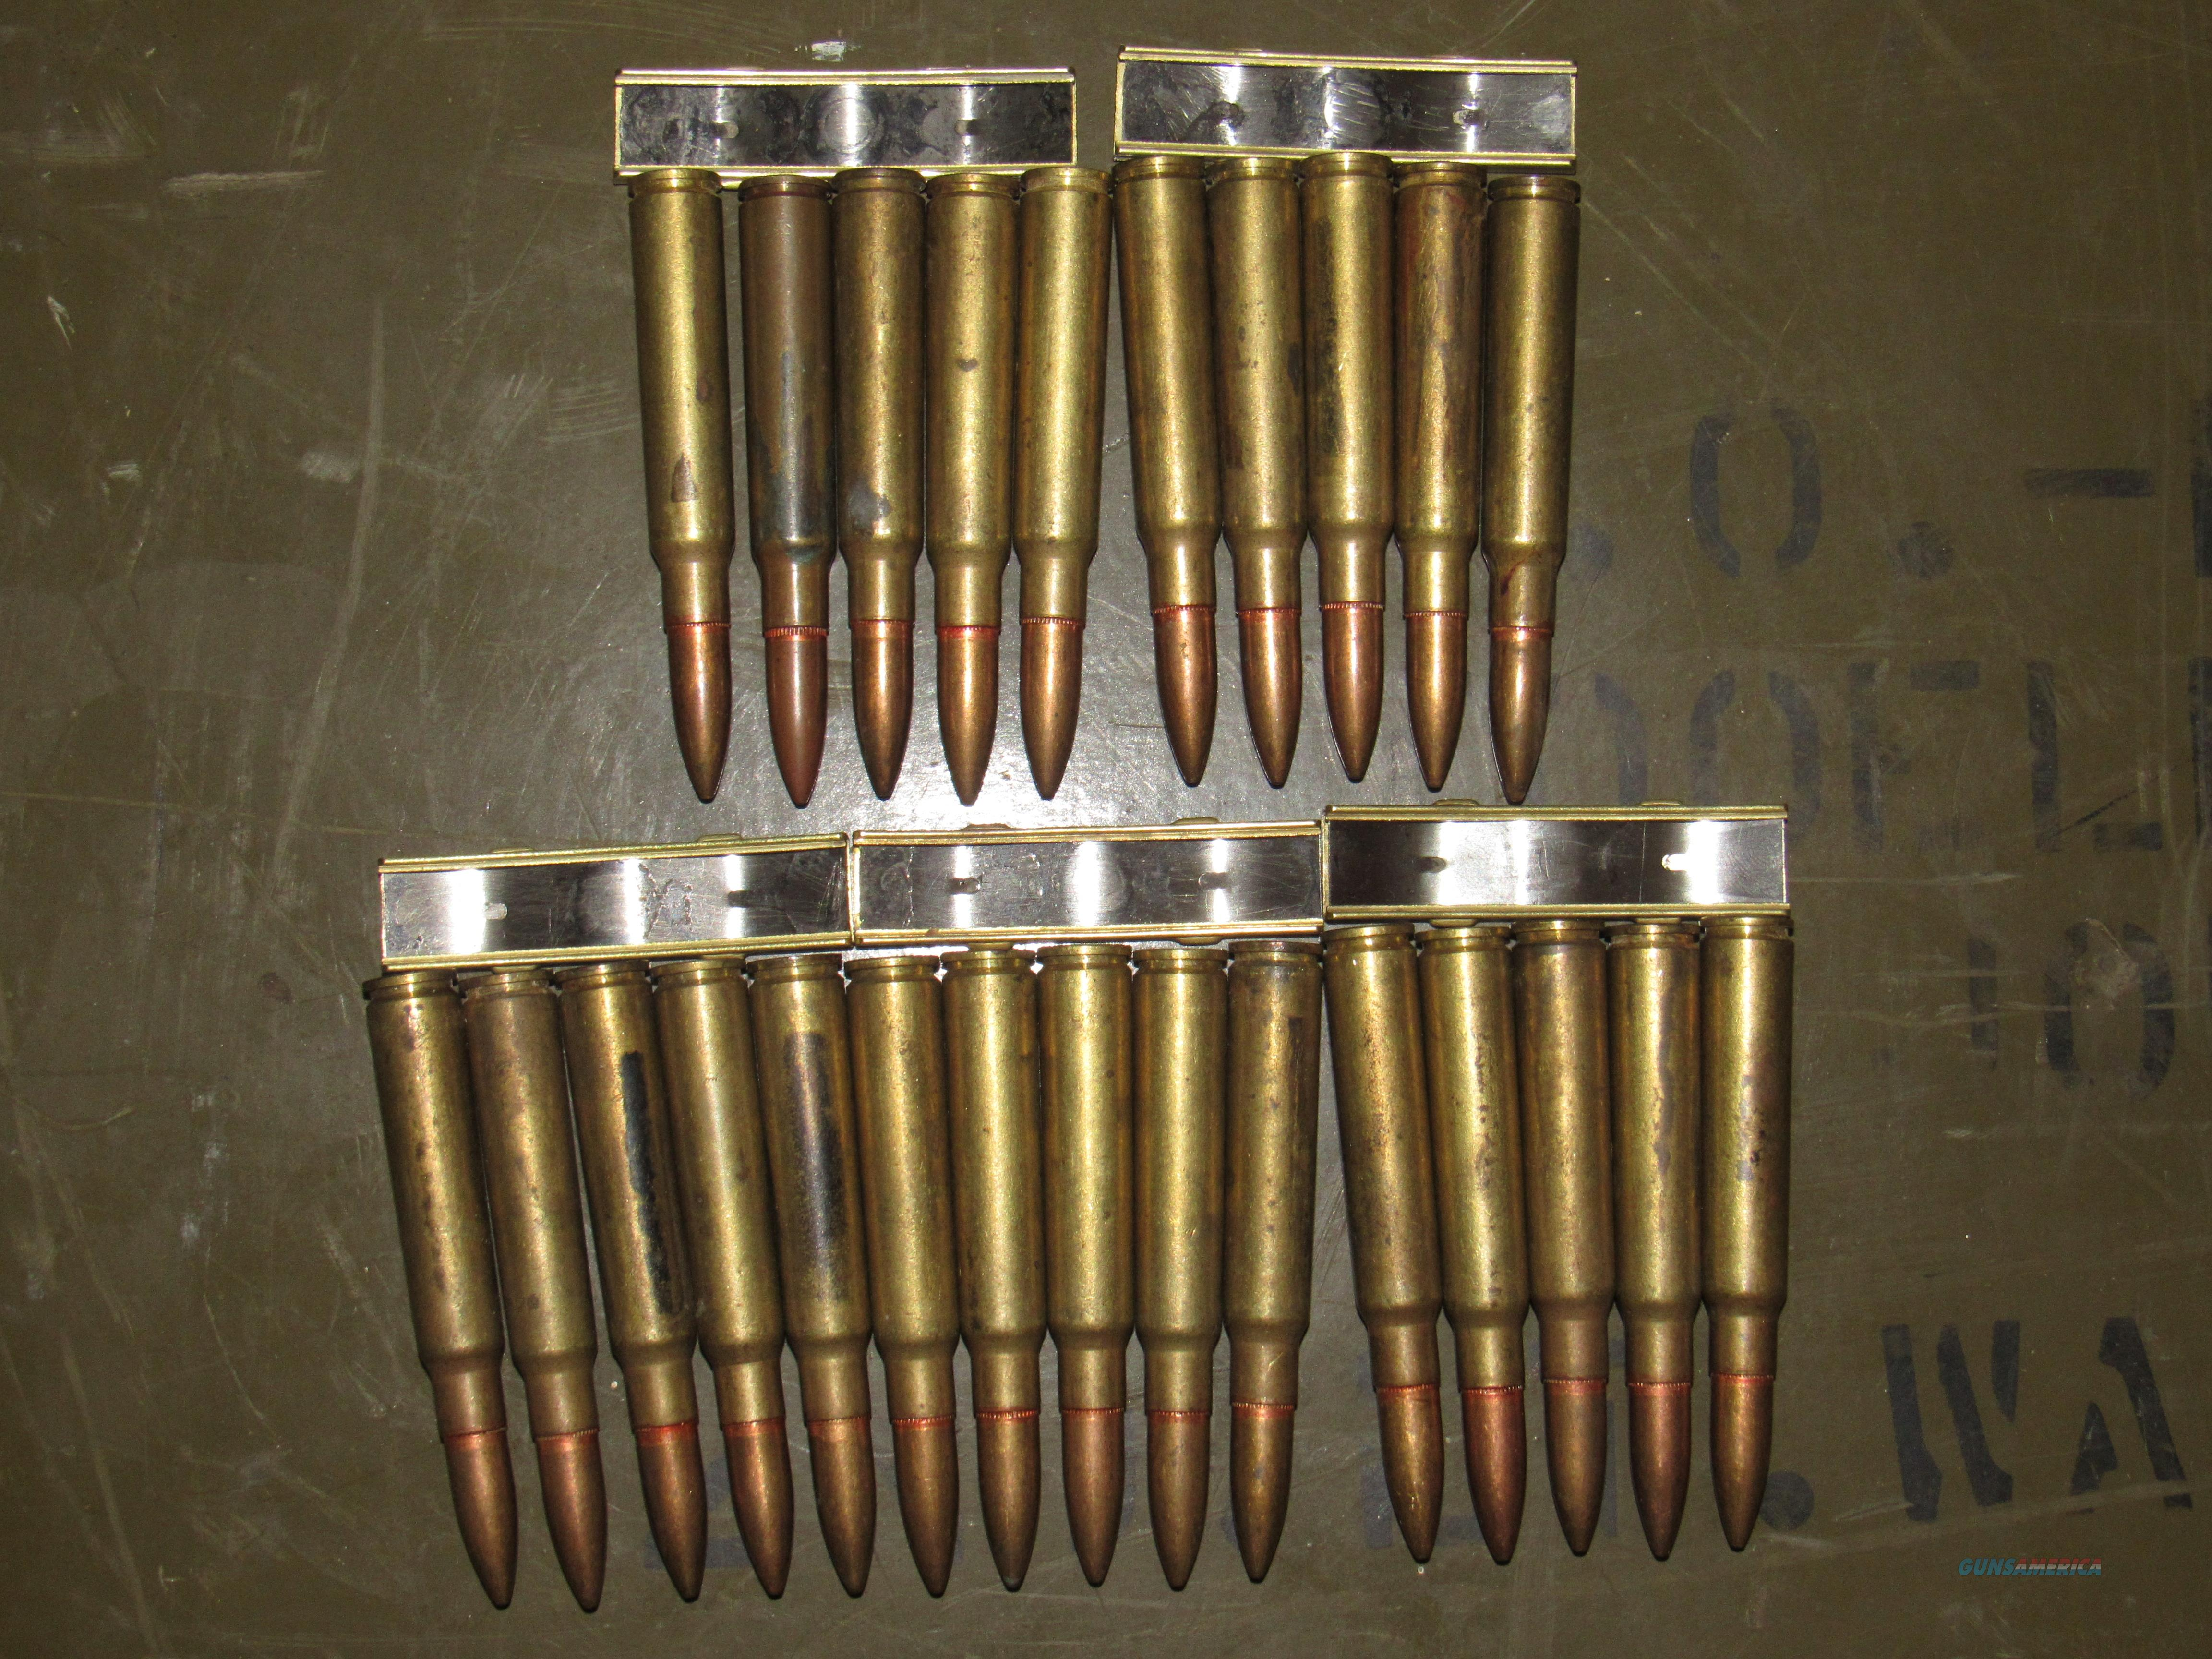 Japanese 5 round Clips 7.7X58 Arisaka rimless Type 99 Rifle ammunition Vintage never fired  Non-Guns > Ammunition